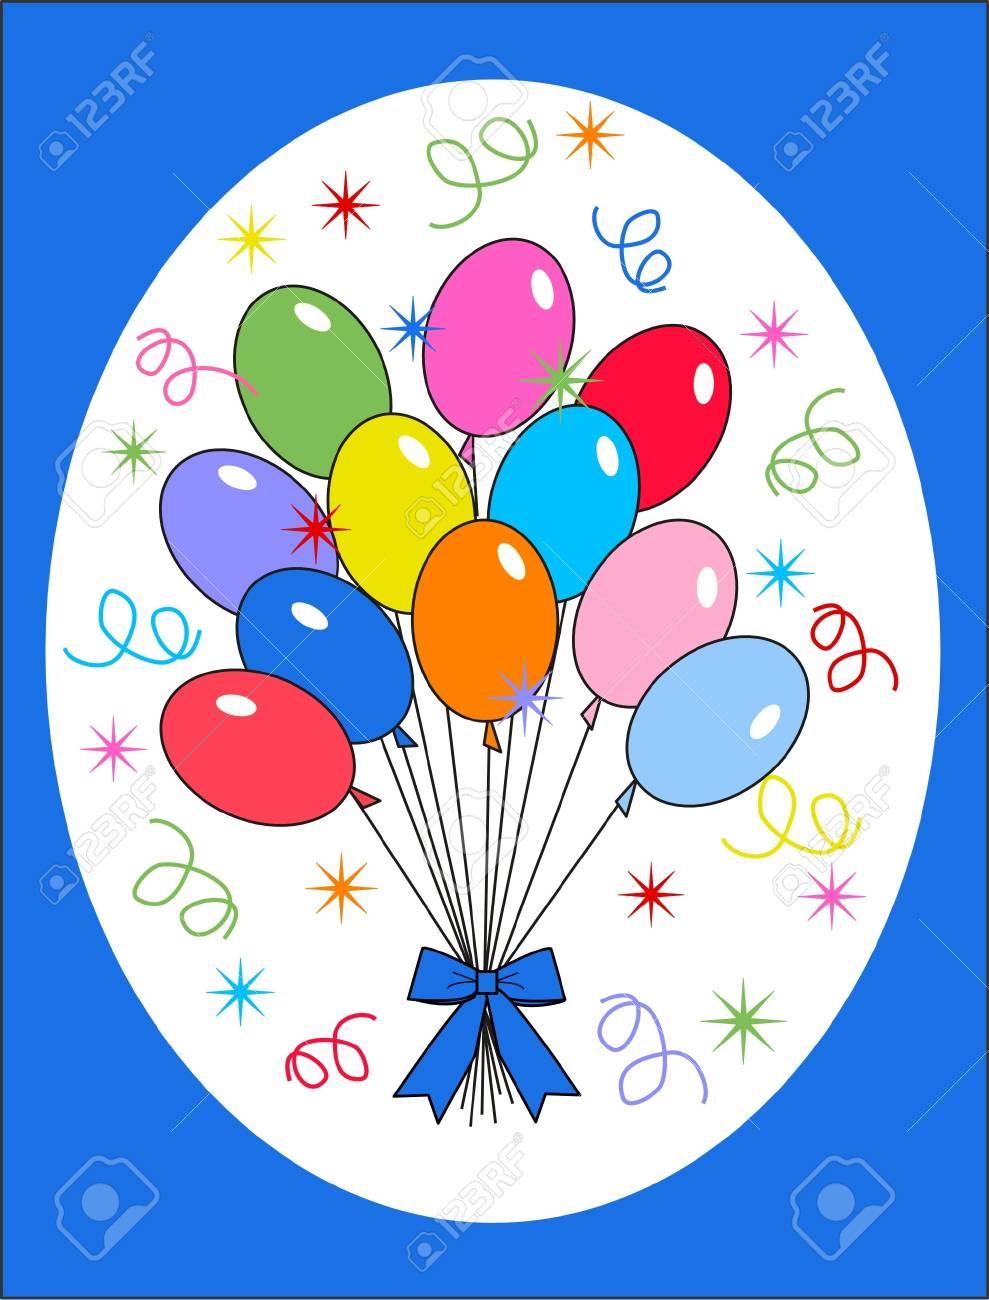 celebration or invitation Stock Vector - 12582470